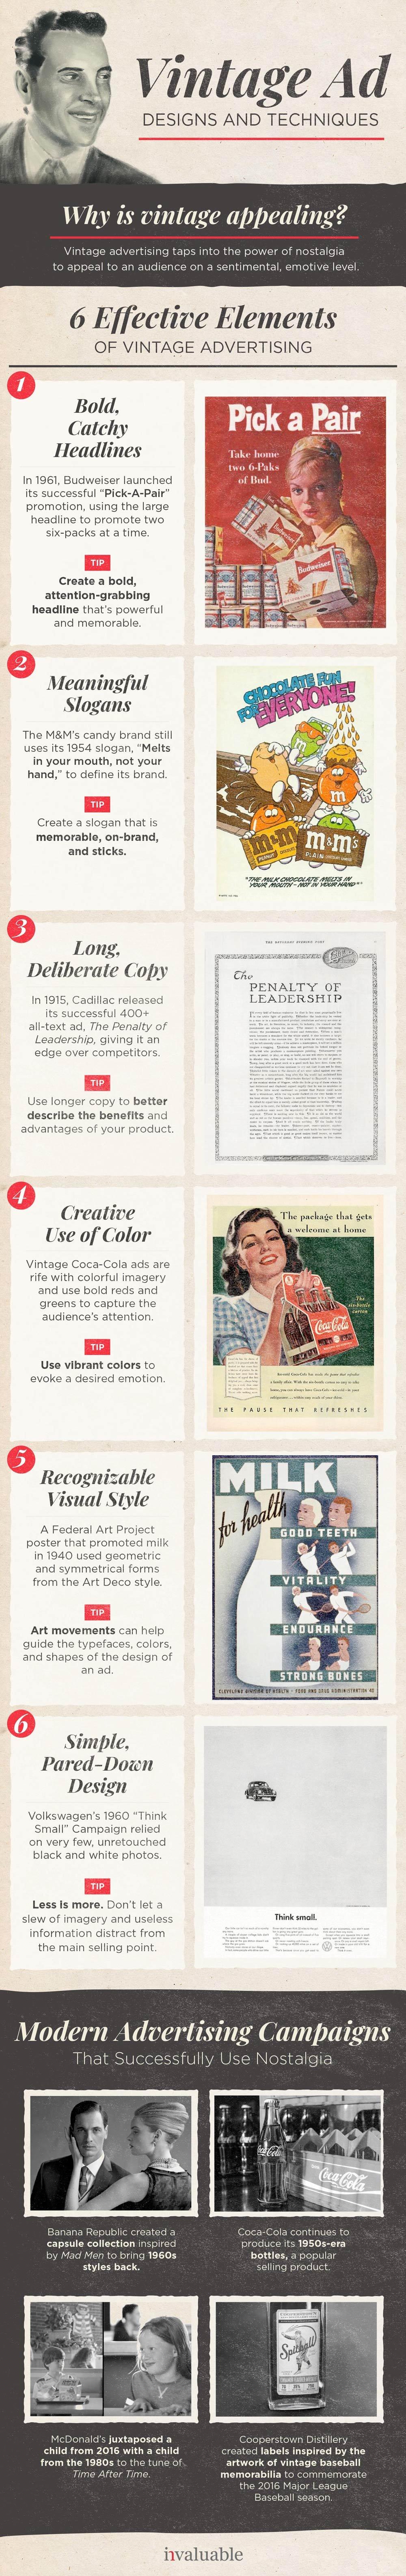 vintage ads visual marketing design